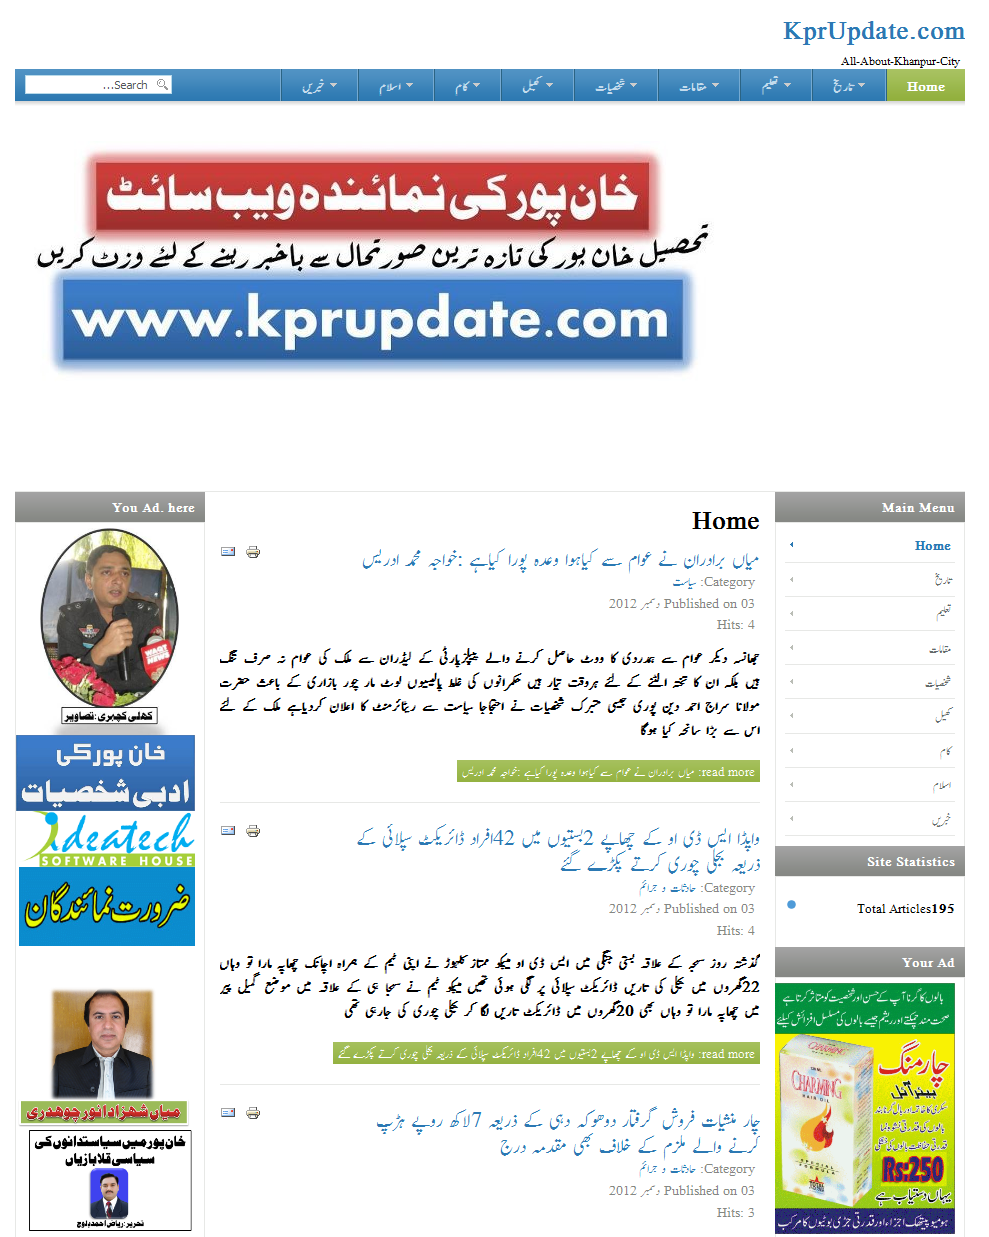 kprupdate.com